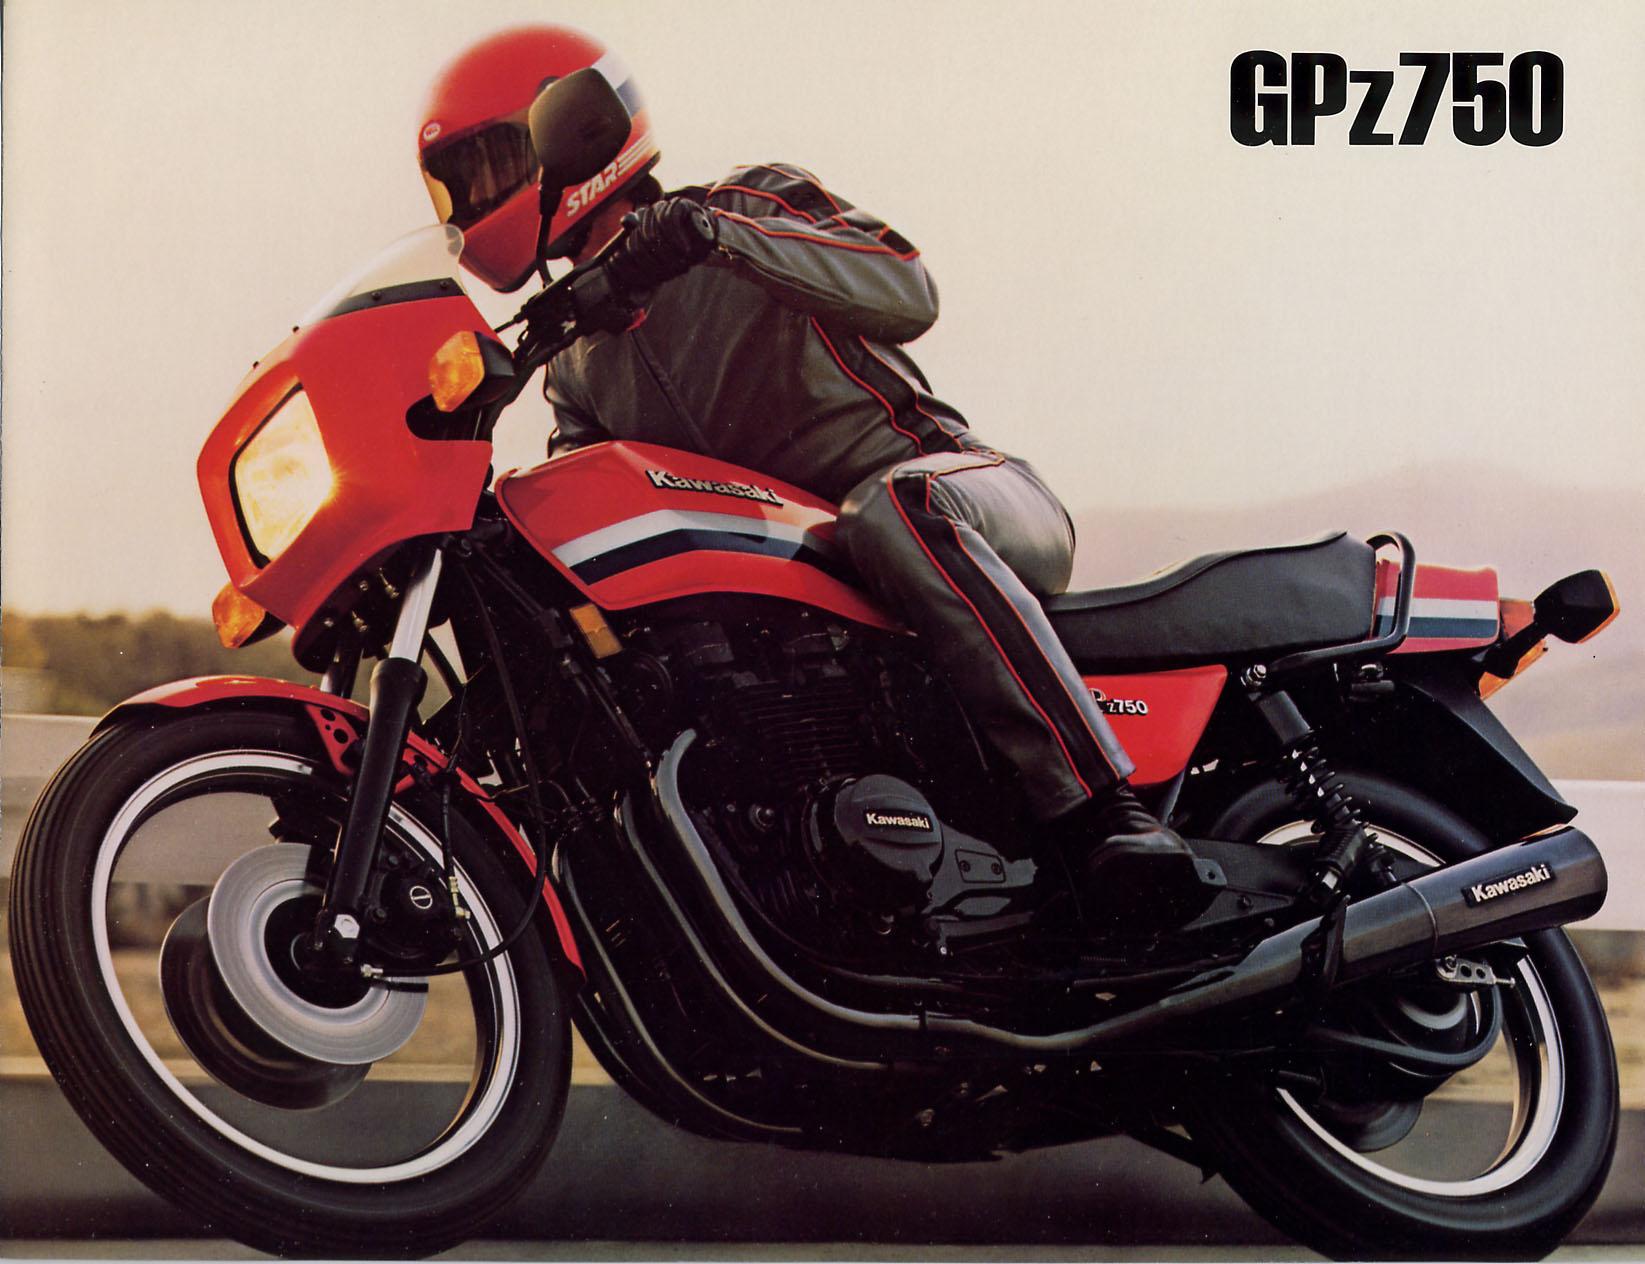 kawa GPZ750 US brochure A.JPG